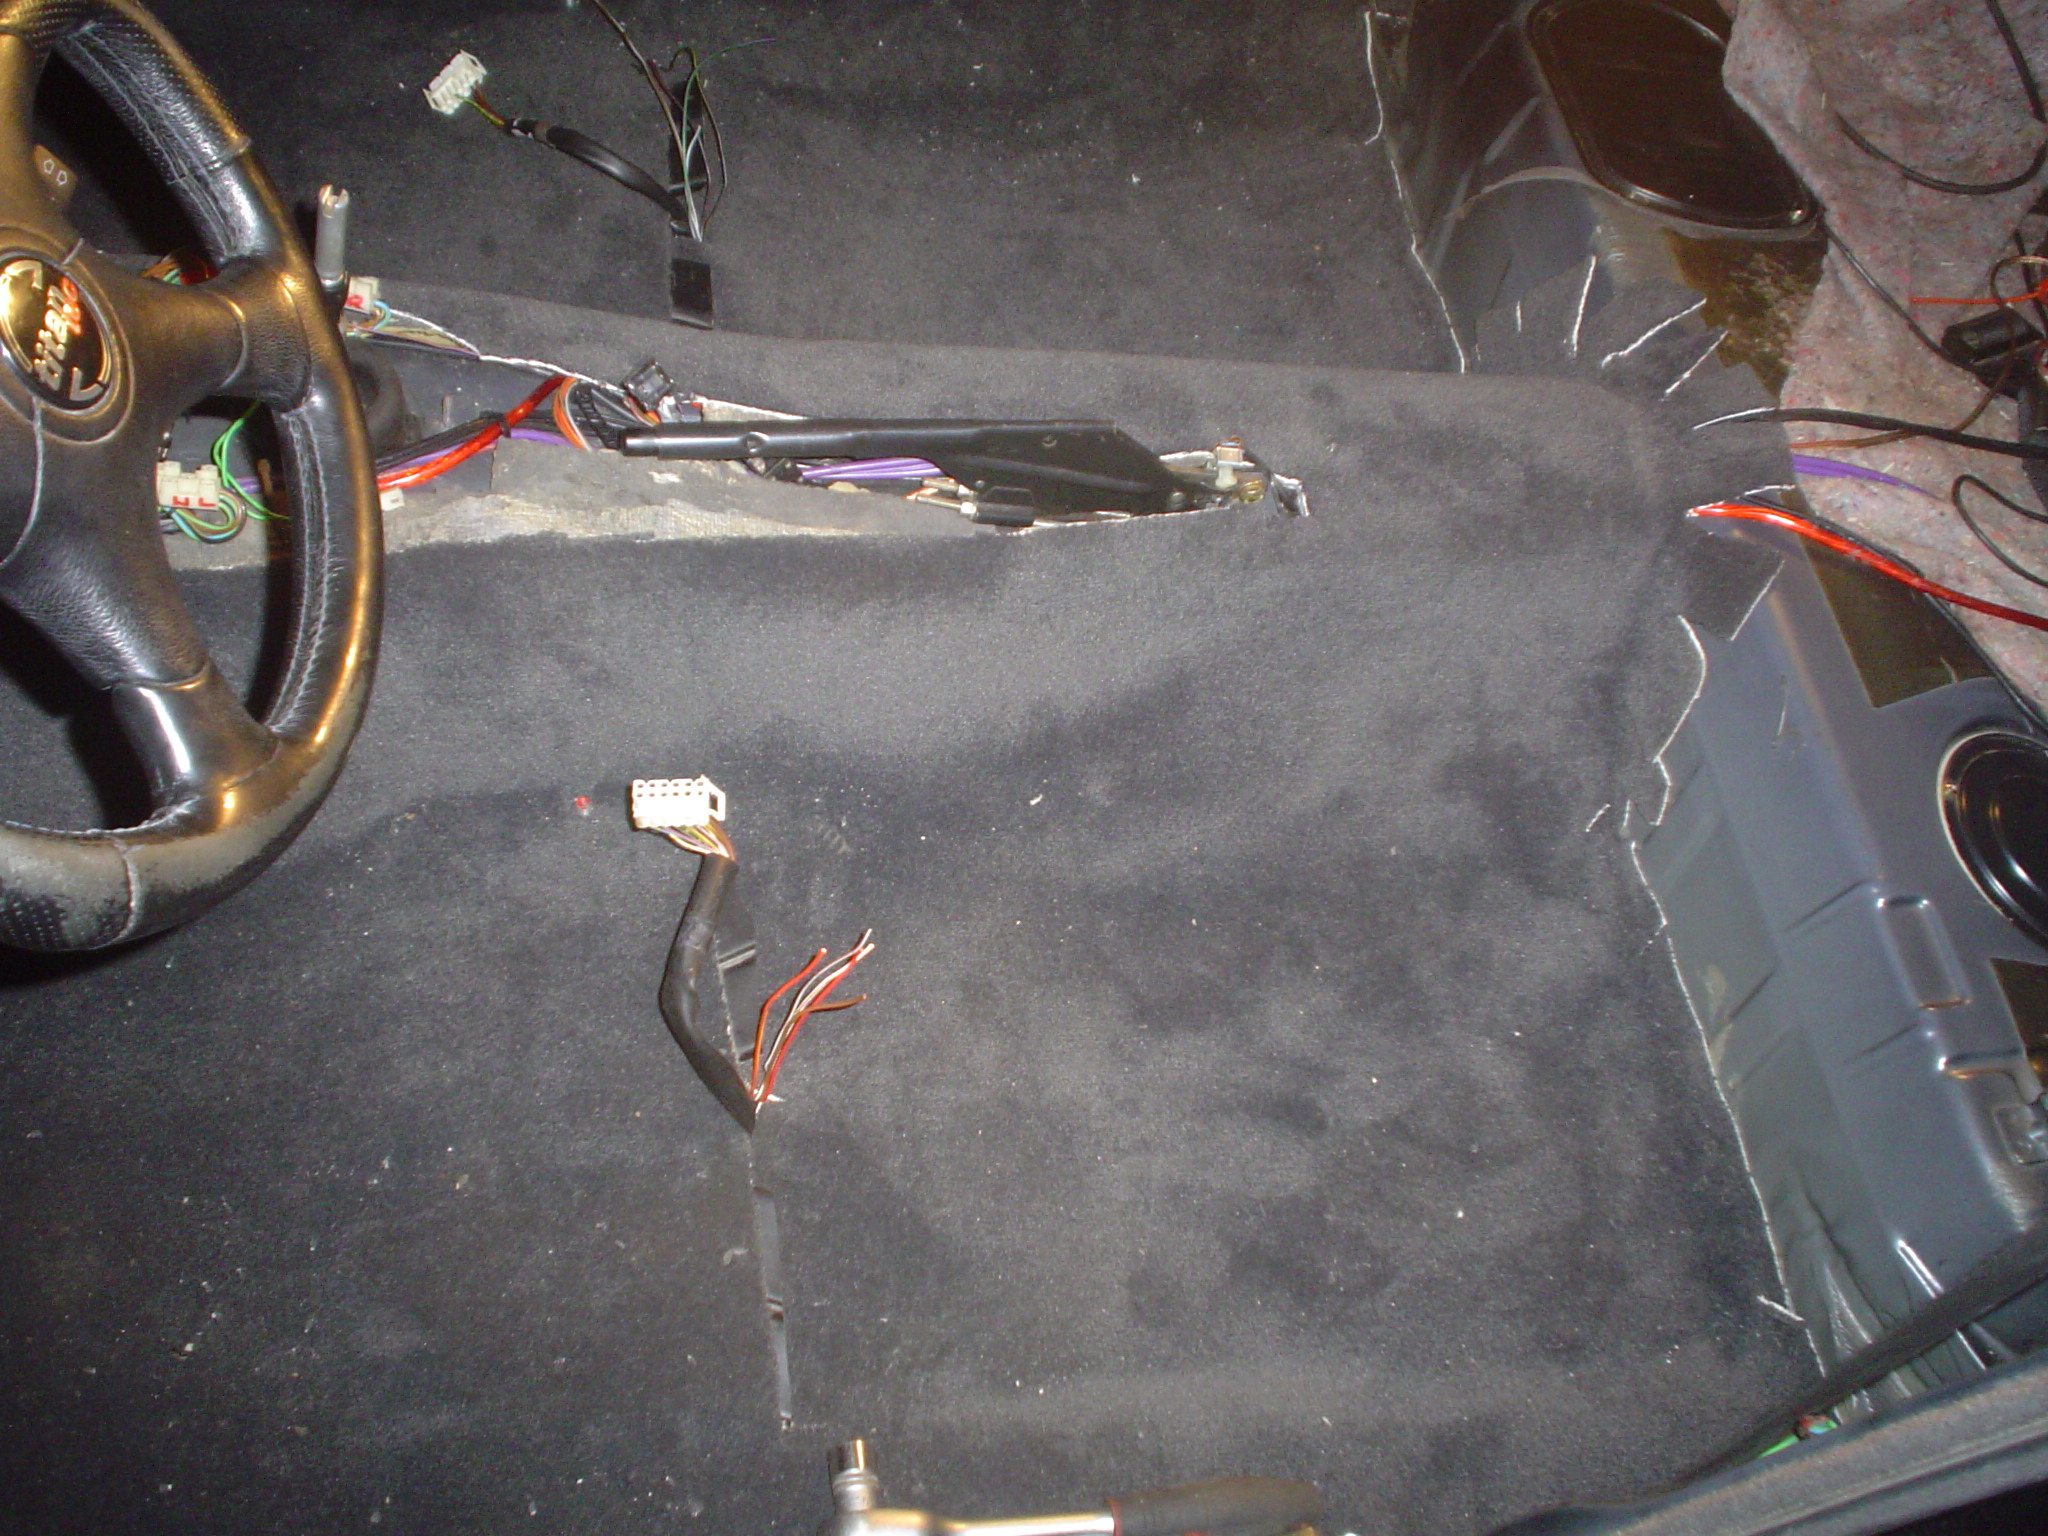 Schablone für Teppich  Ausstattung  E30Talkcom